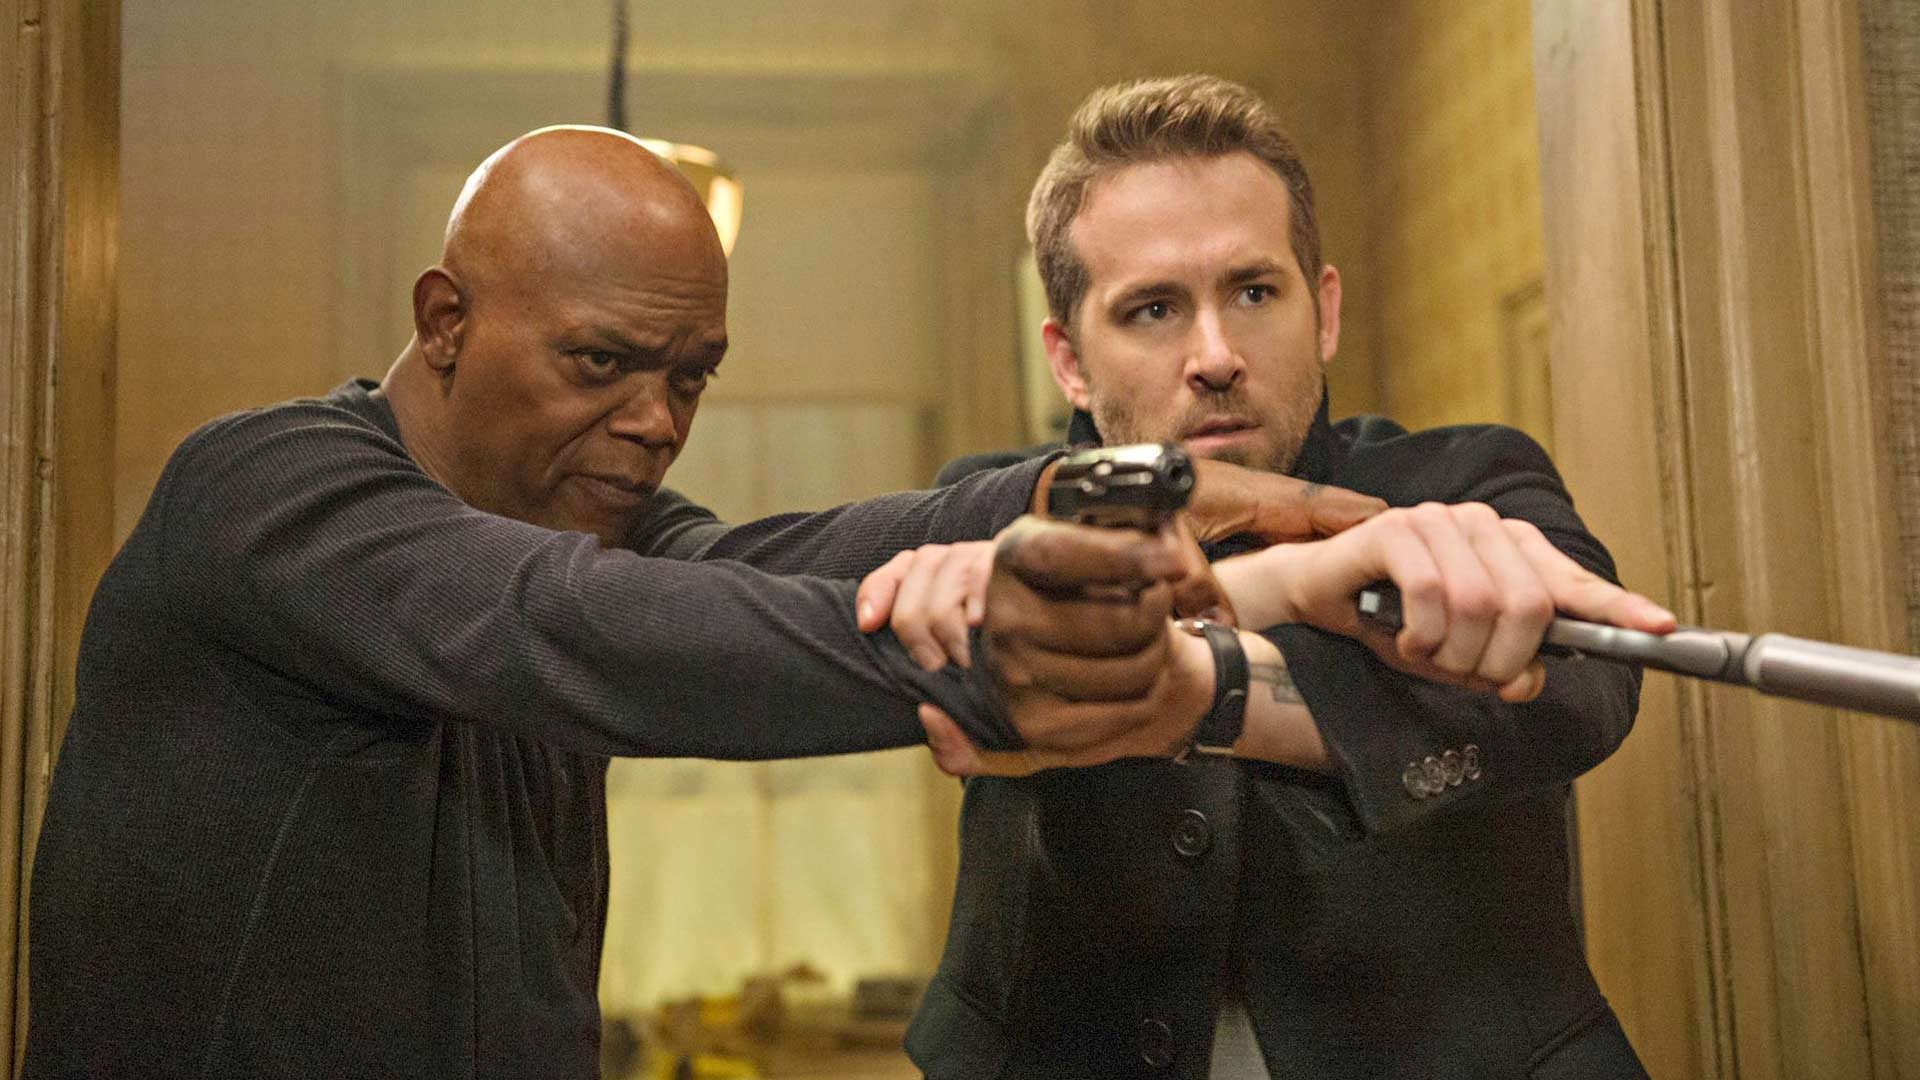 Samuel L. Jackson  ja Ryan Reynolds elokuvassaHitman's Bodyguard.